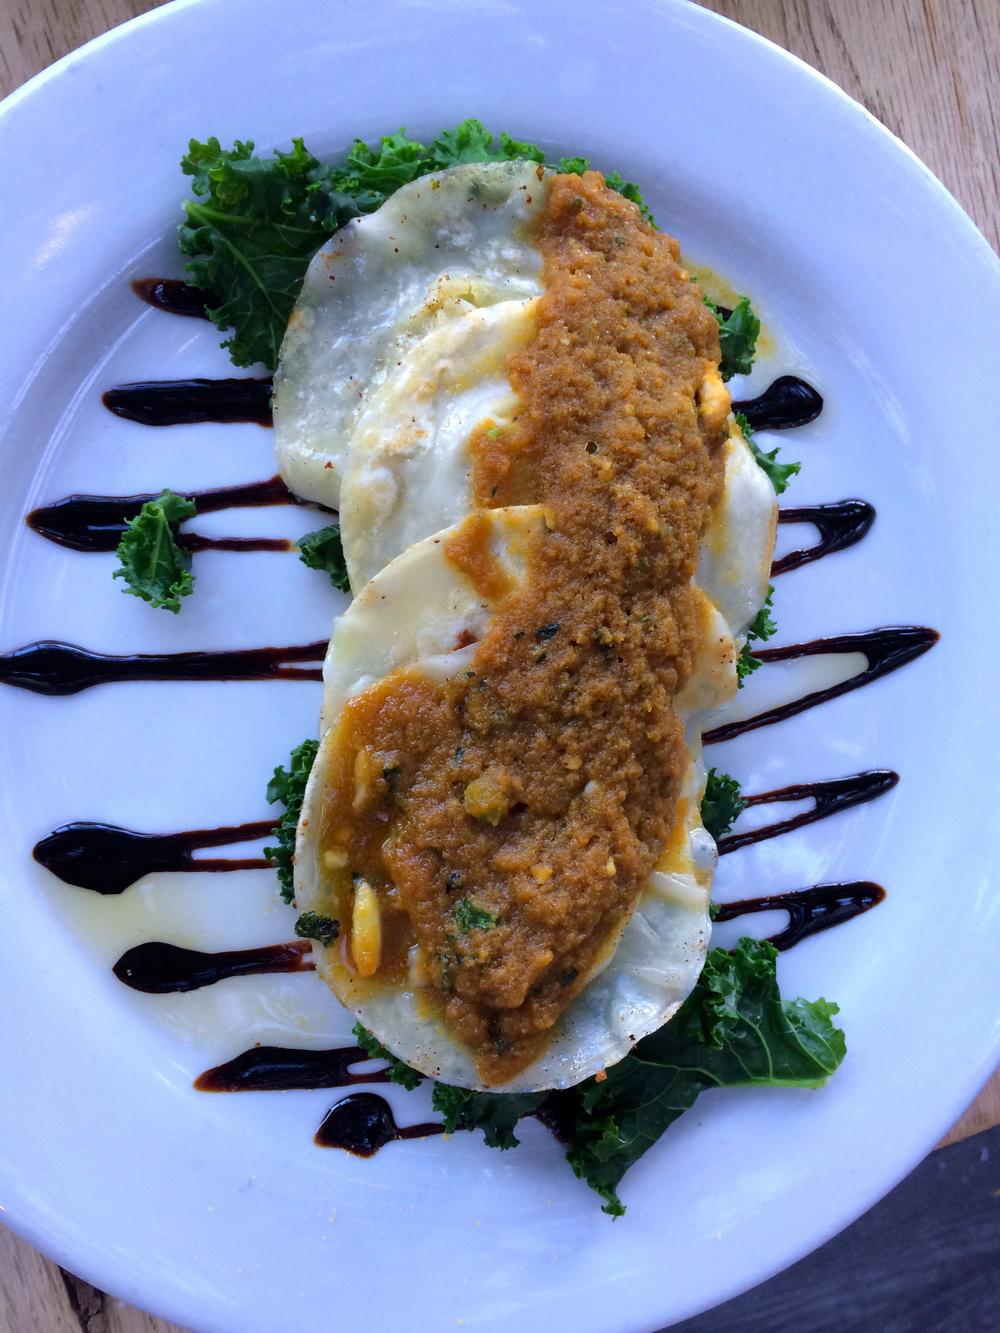 Sage Vegan Bistro - Potato Broccoli Perogies.